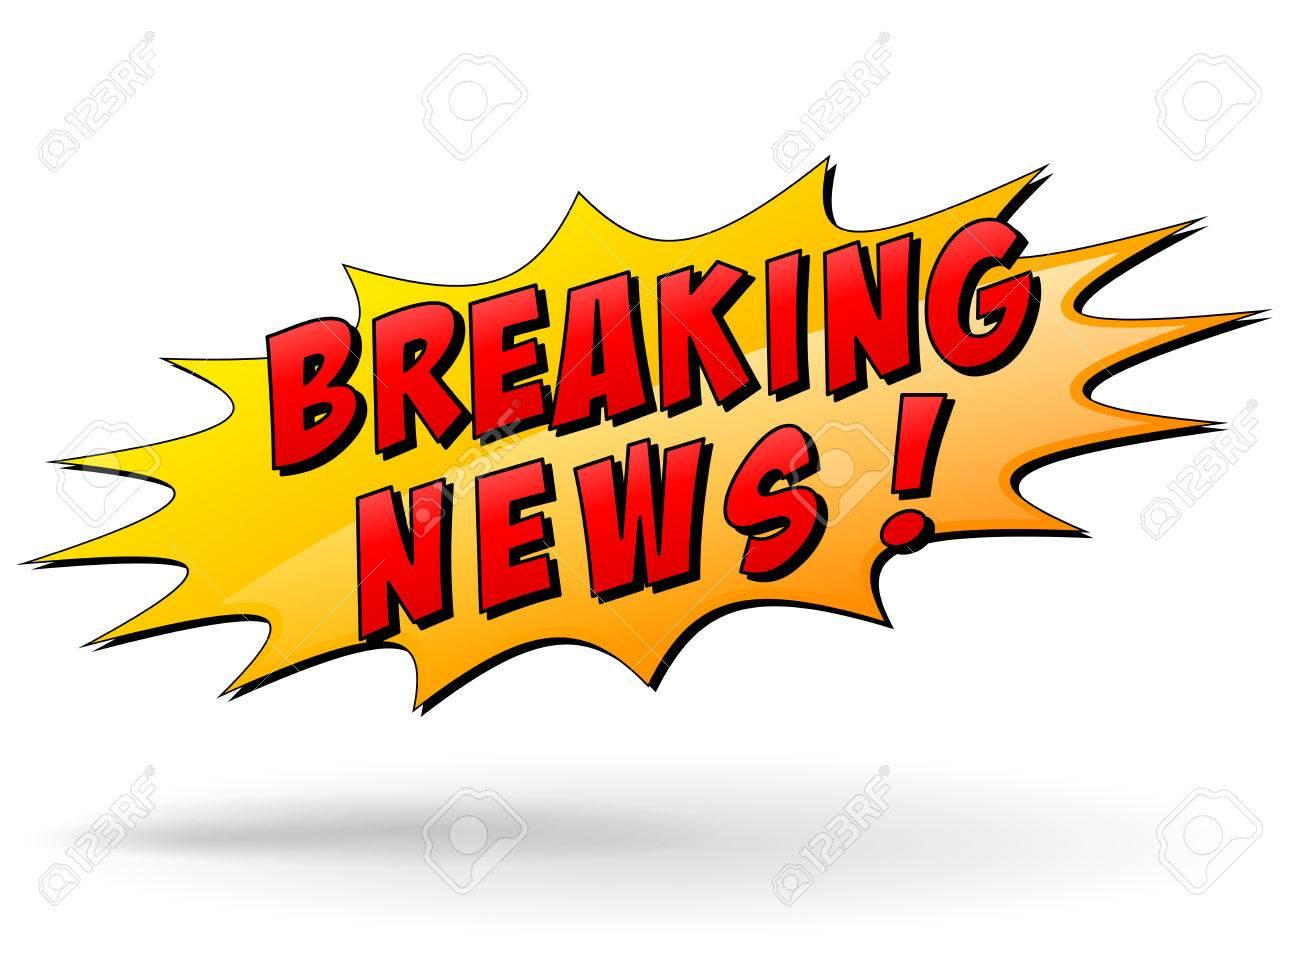 Vector illustration of breaking news star icon.